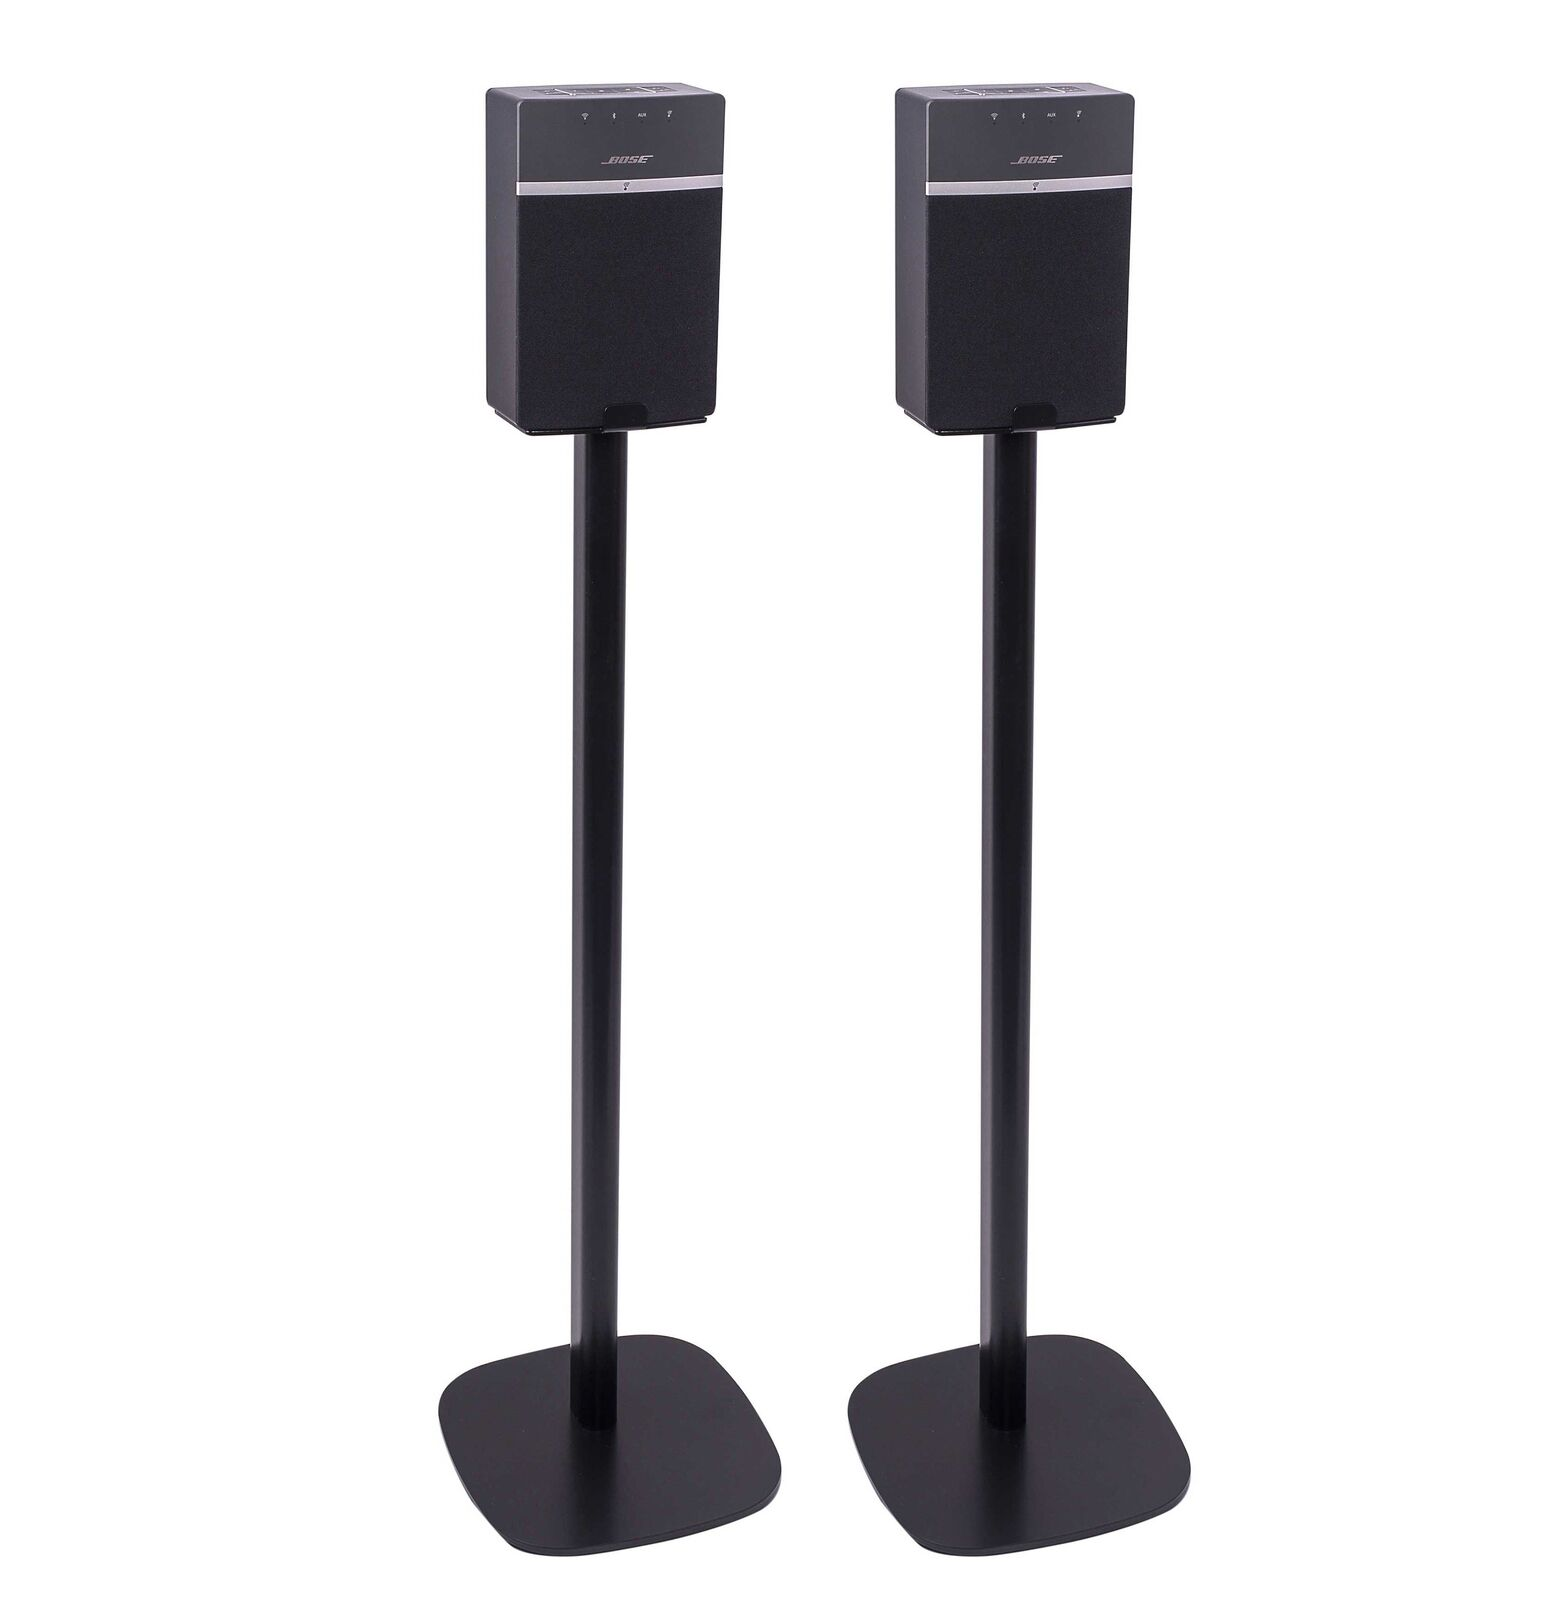 Vebos Standfuß Bose Soundtouch 10 black ein paar